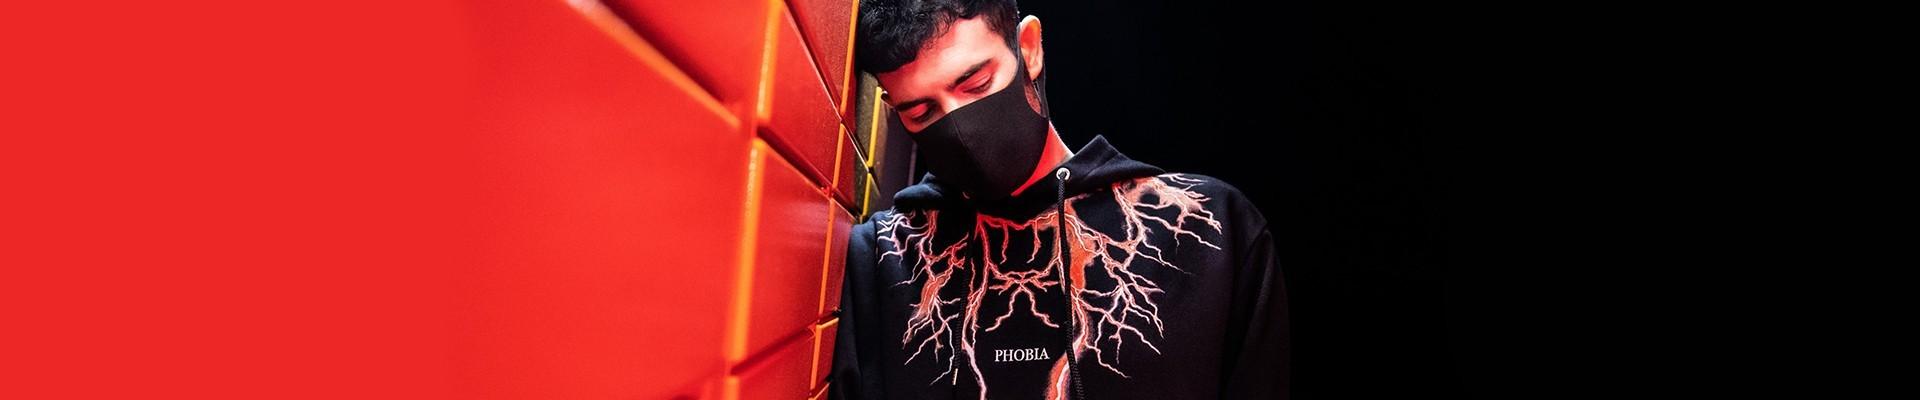 phobia banner